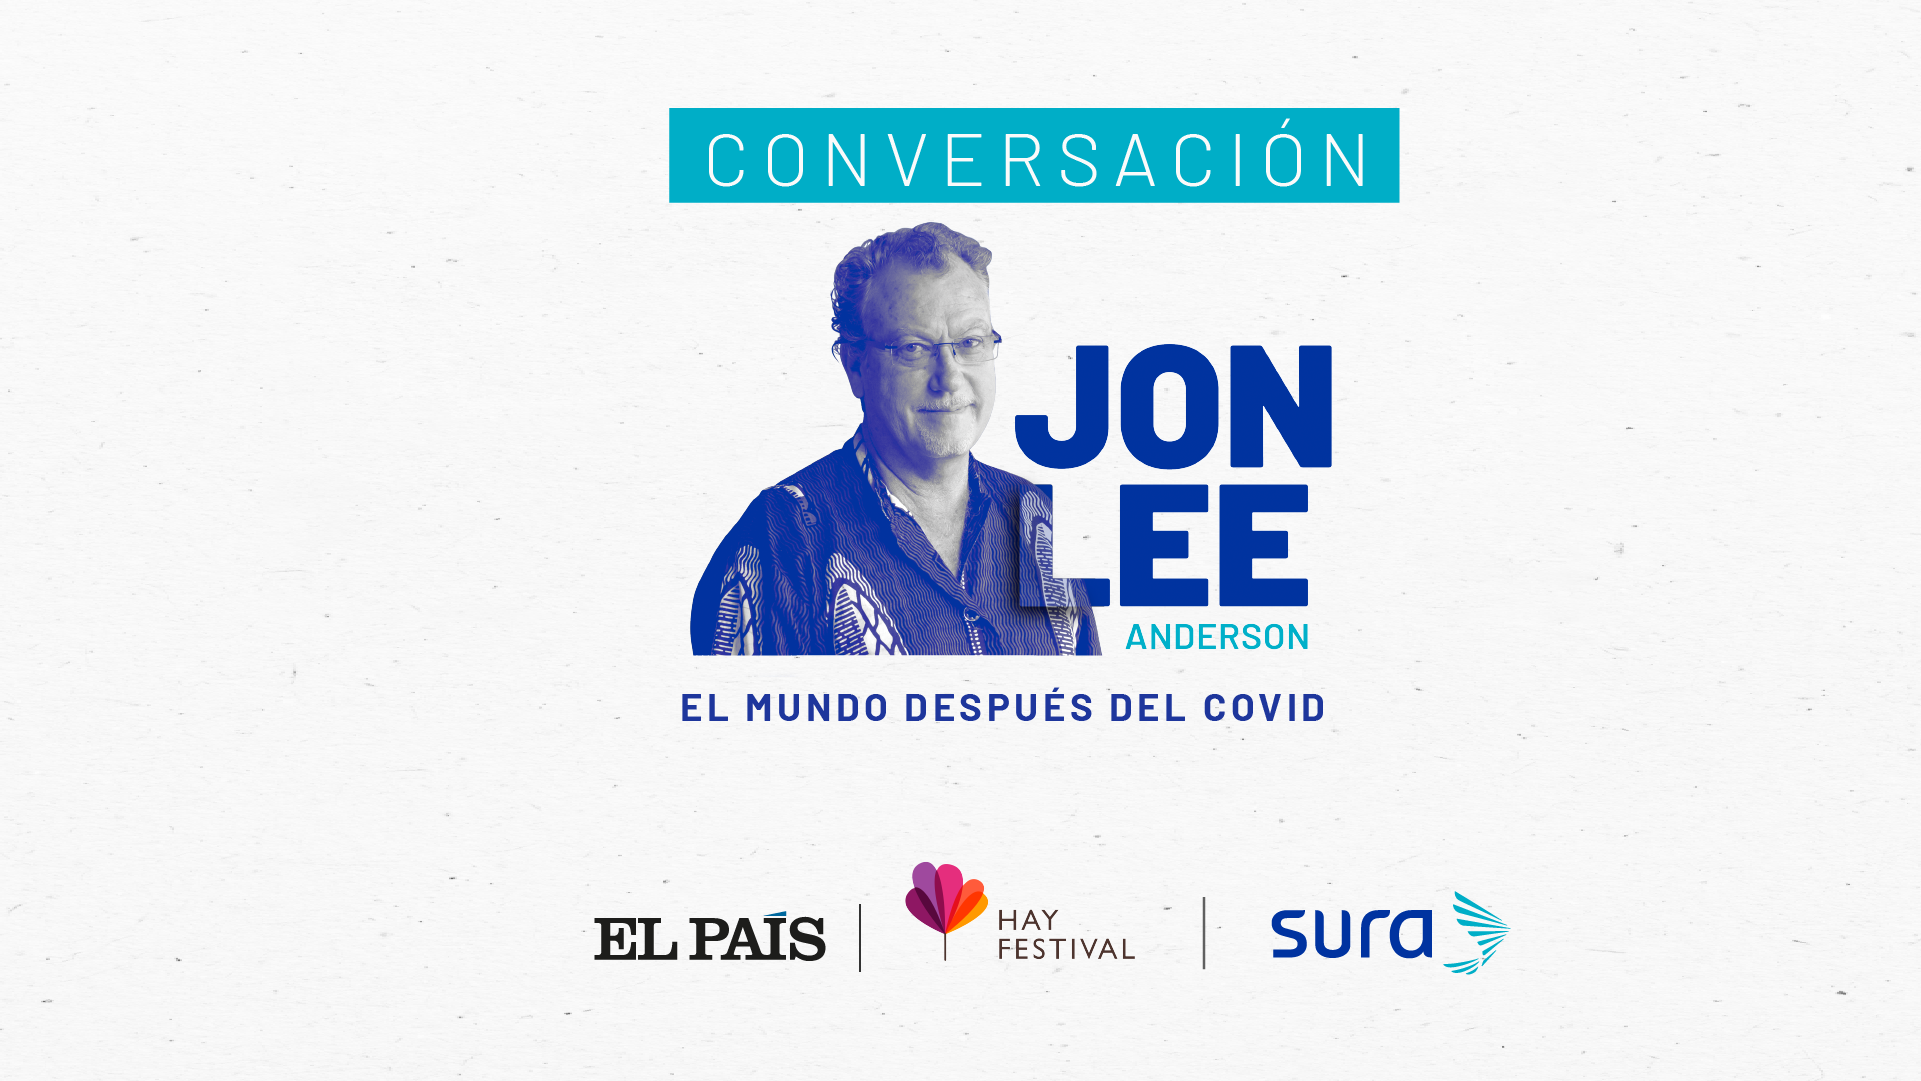 Jon Lee Anderson